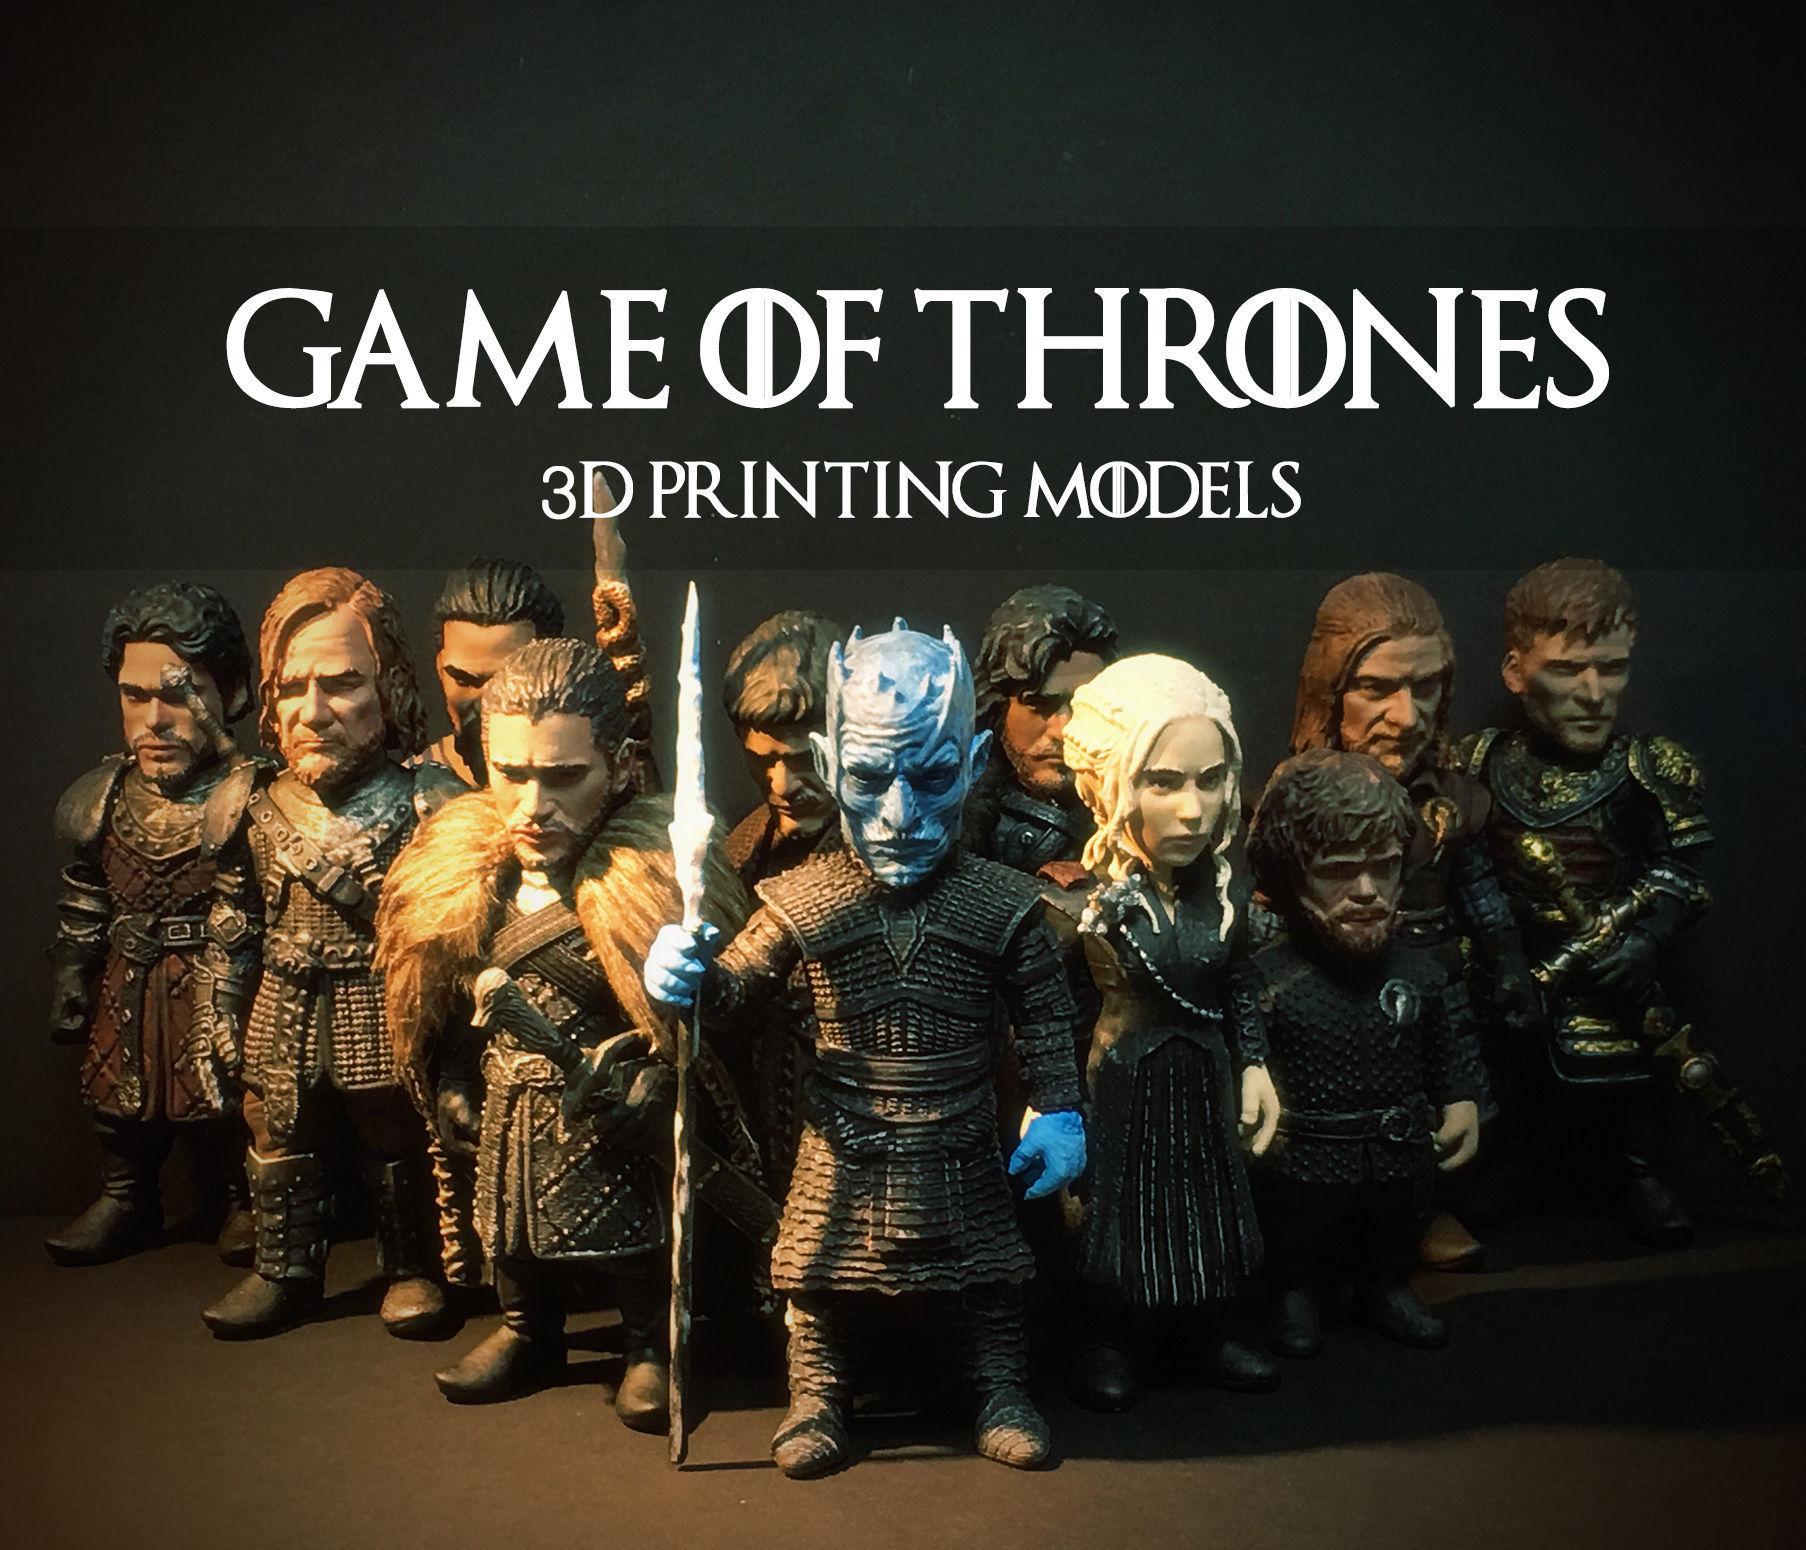 GAME OF THRONES 3D PRINTING MODEL SET